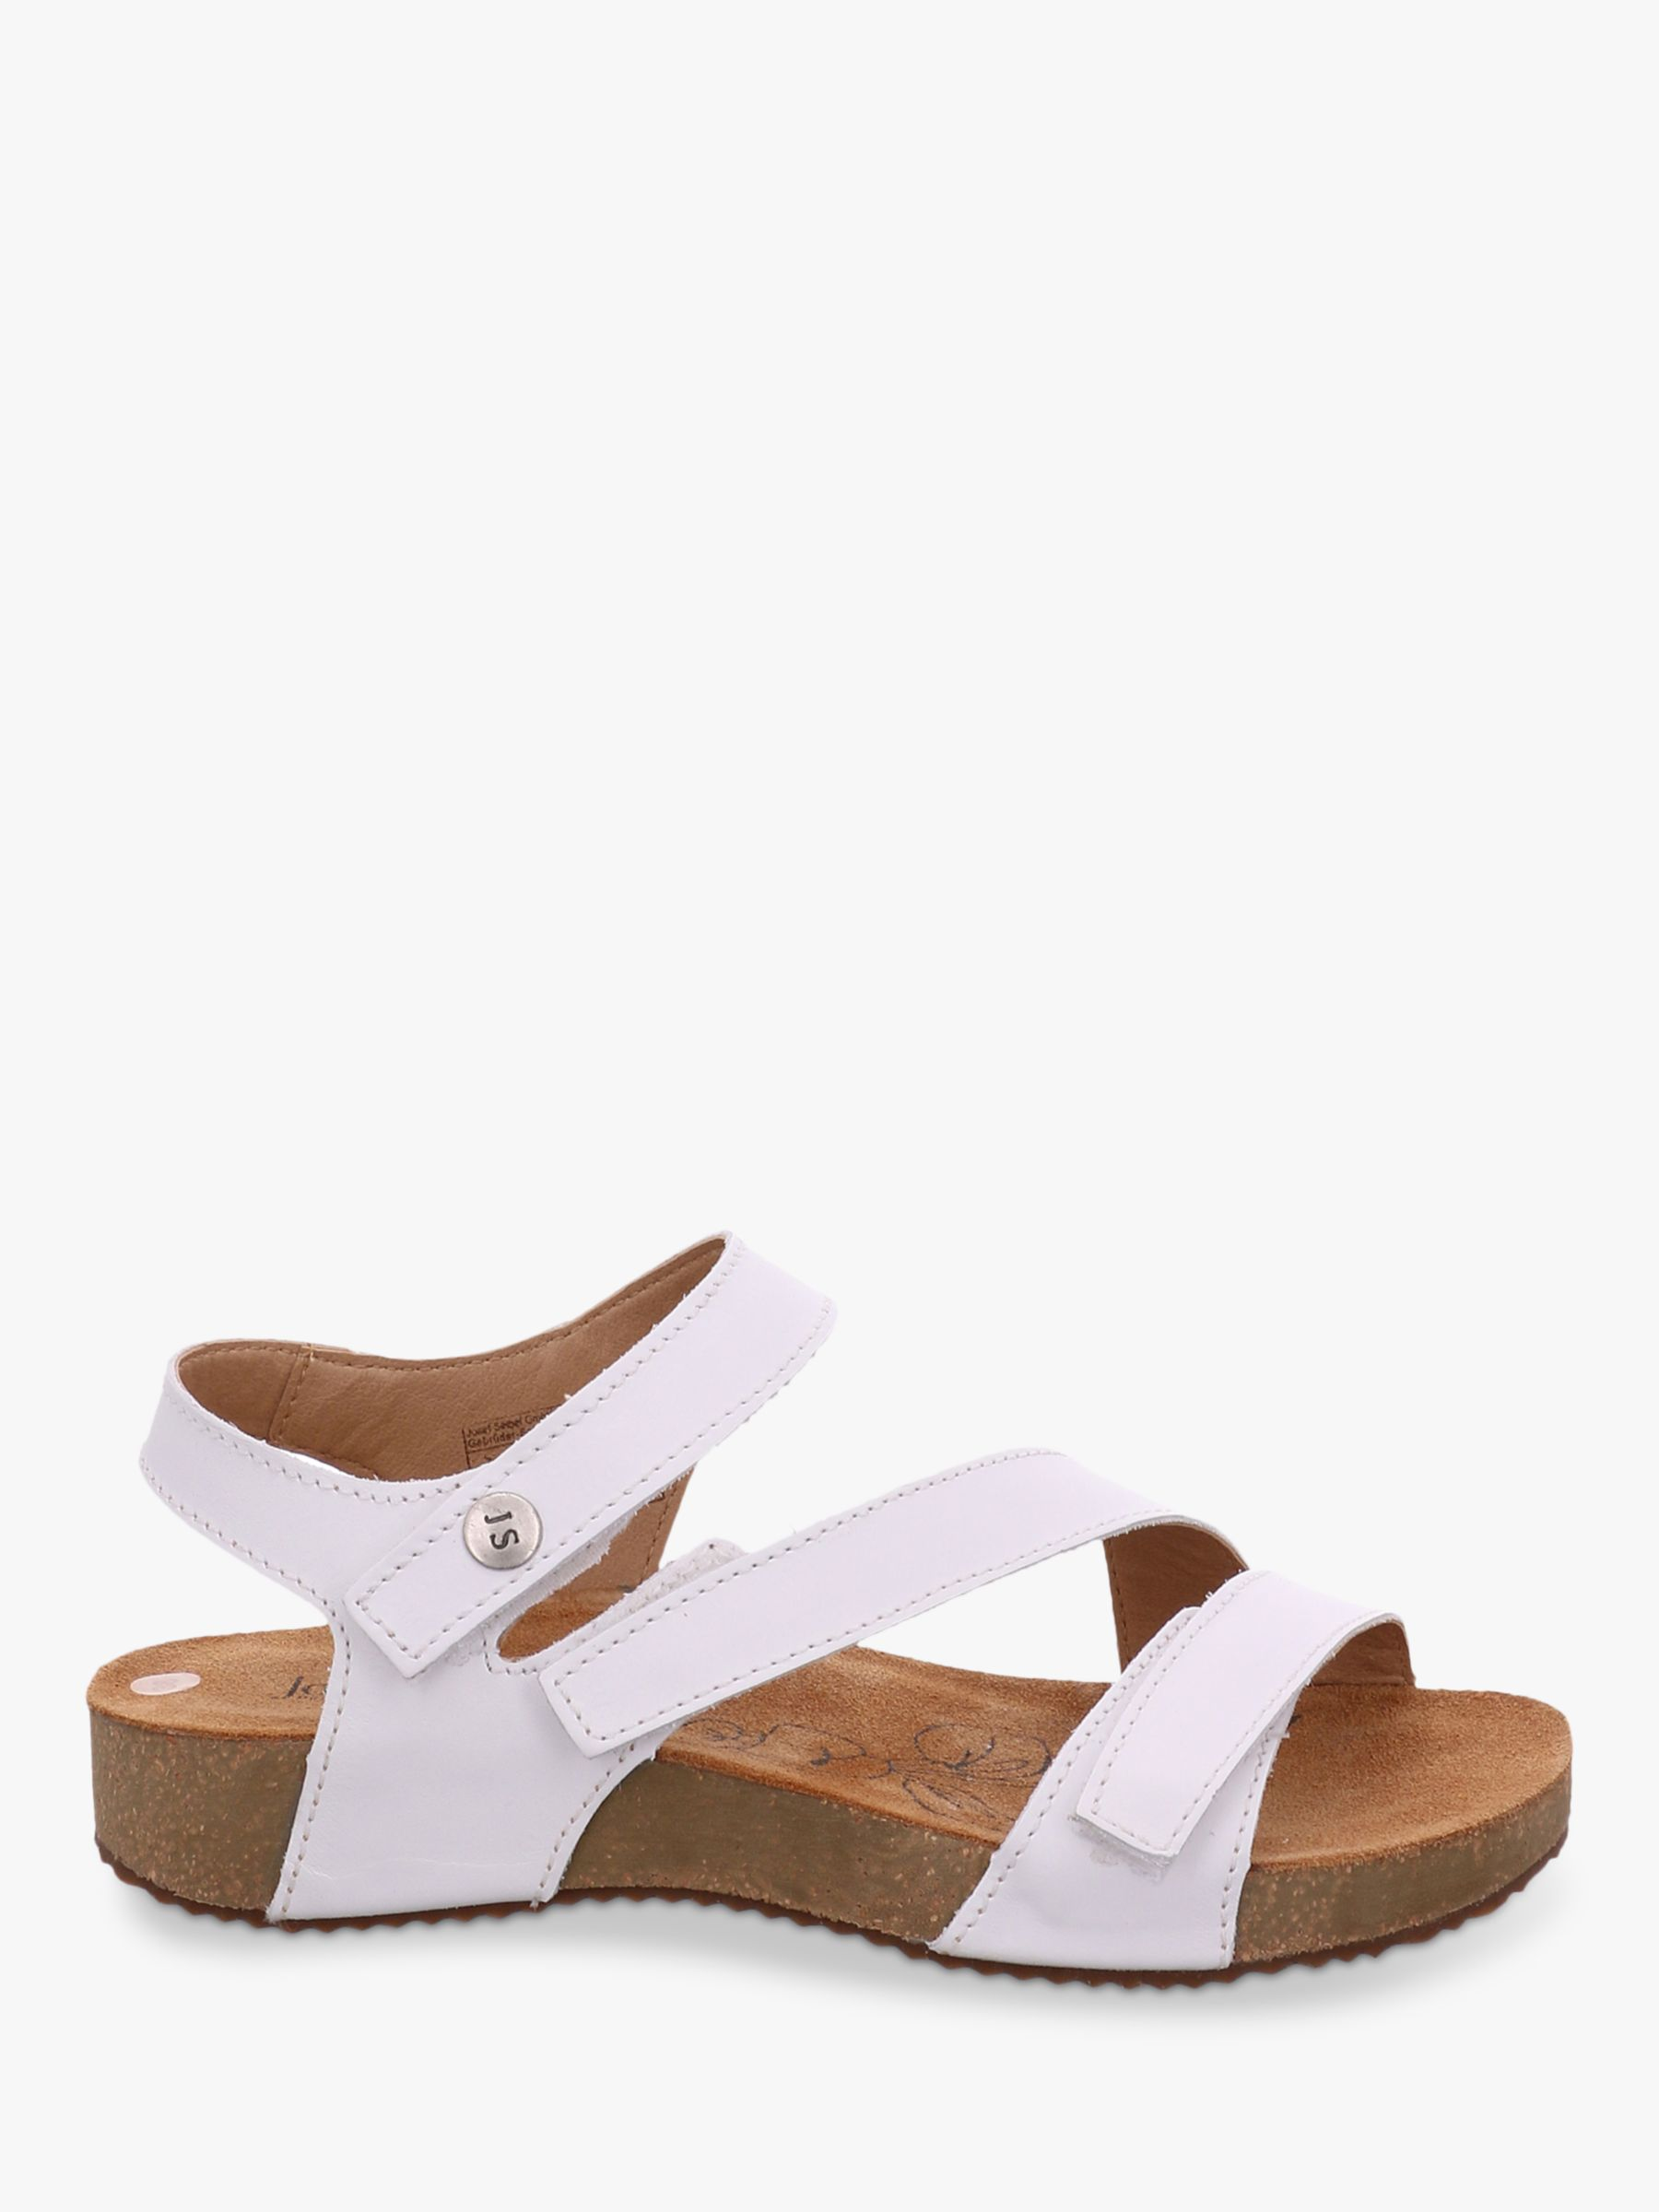 Josef Seibel Josef Seibel Tonga 25 Triple Strap Sandals